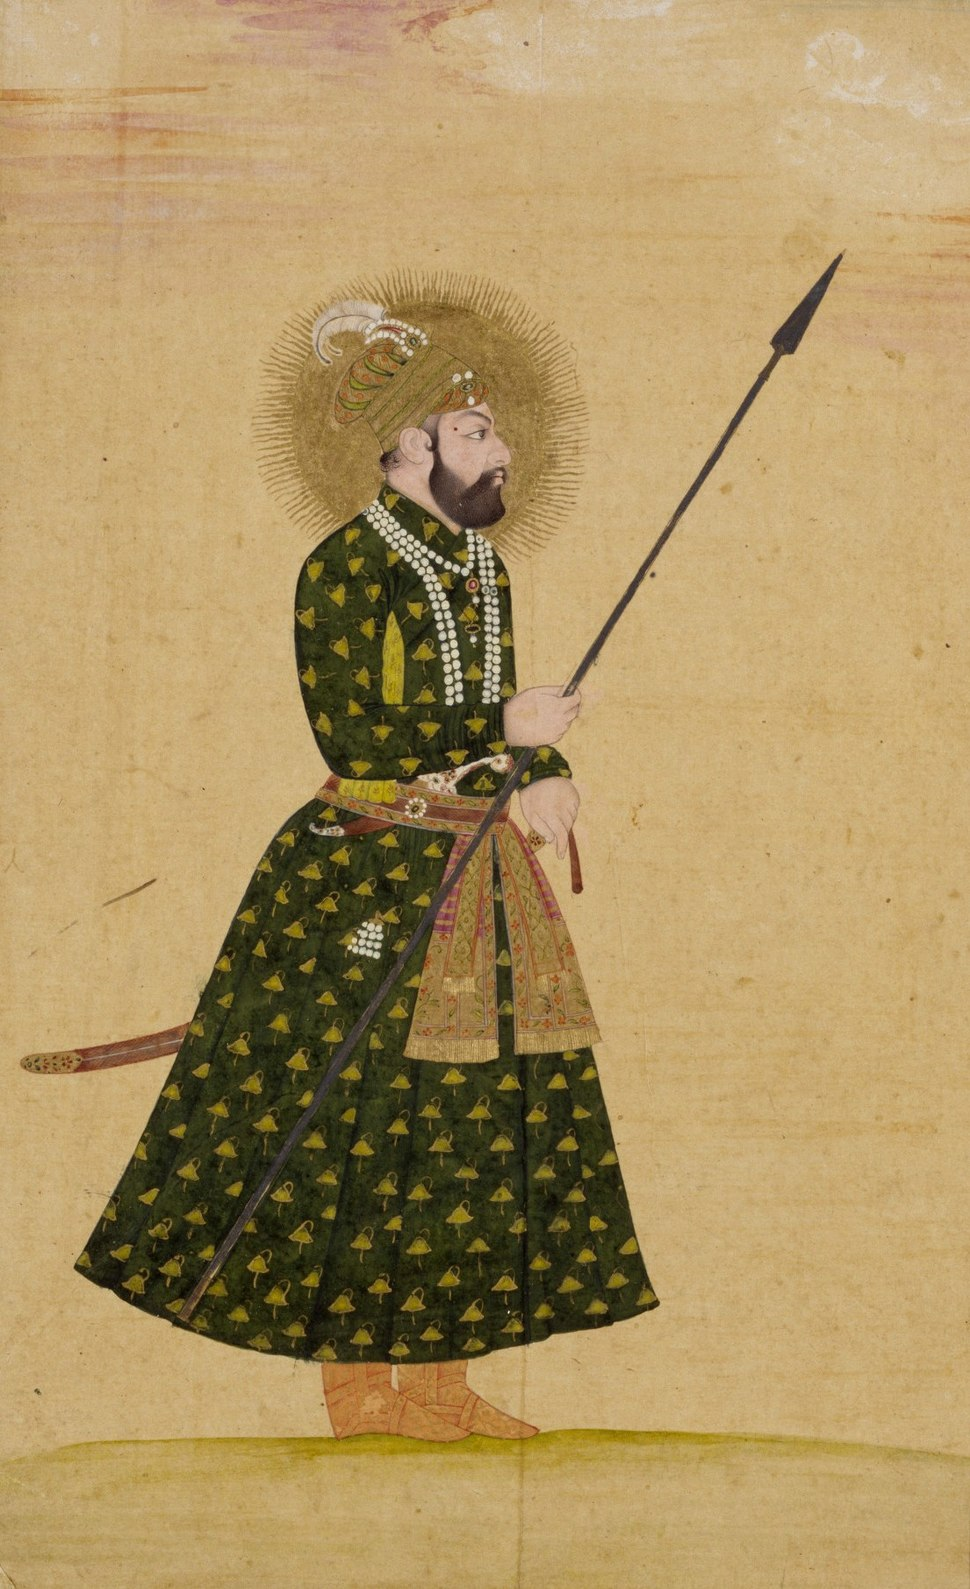 Jahandar Shah, Mughal Emperor.